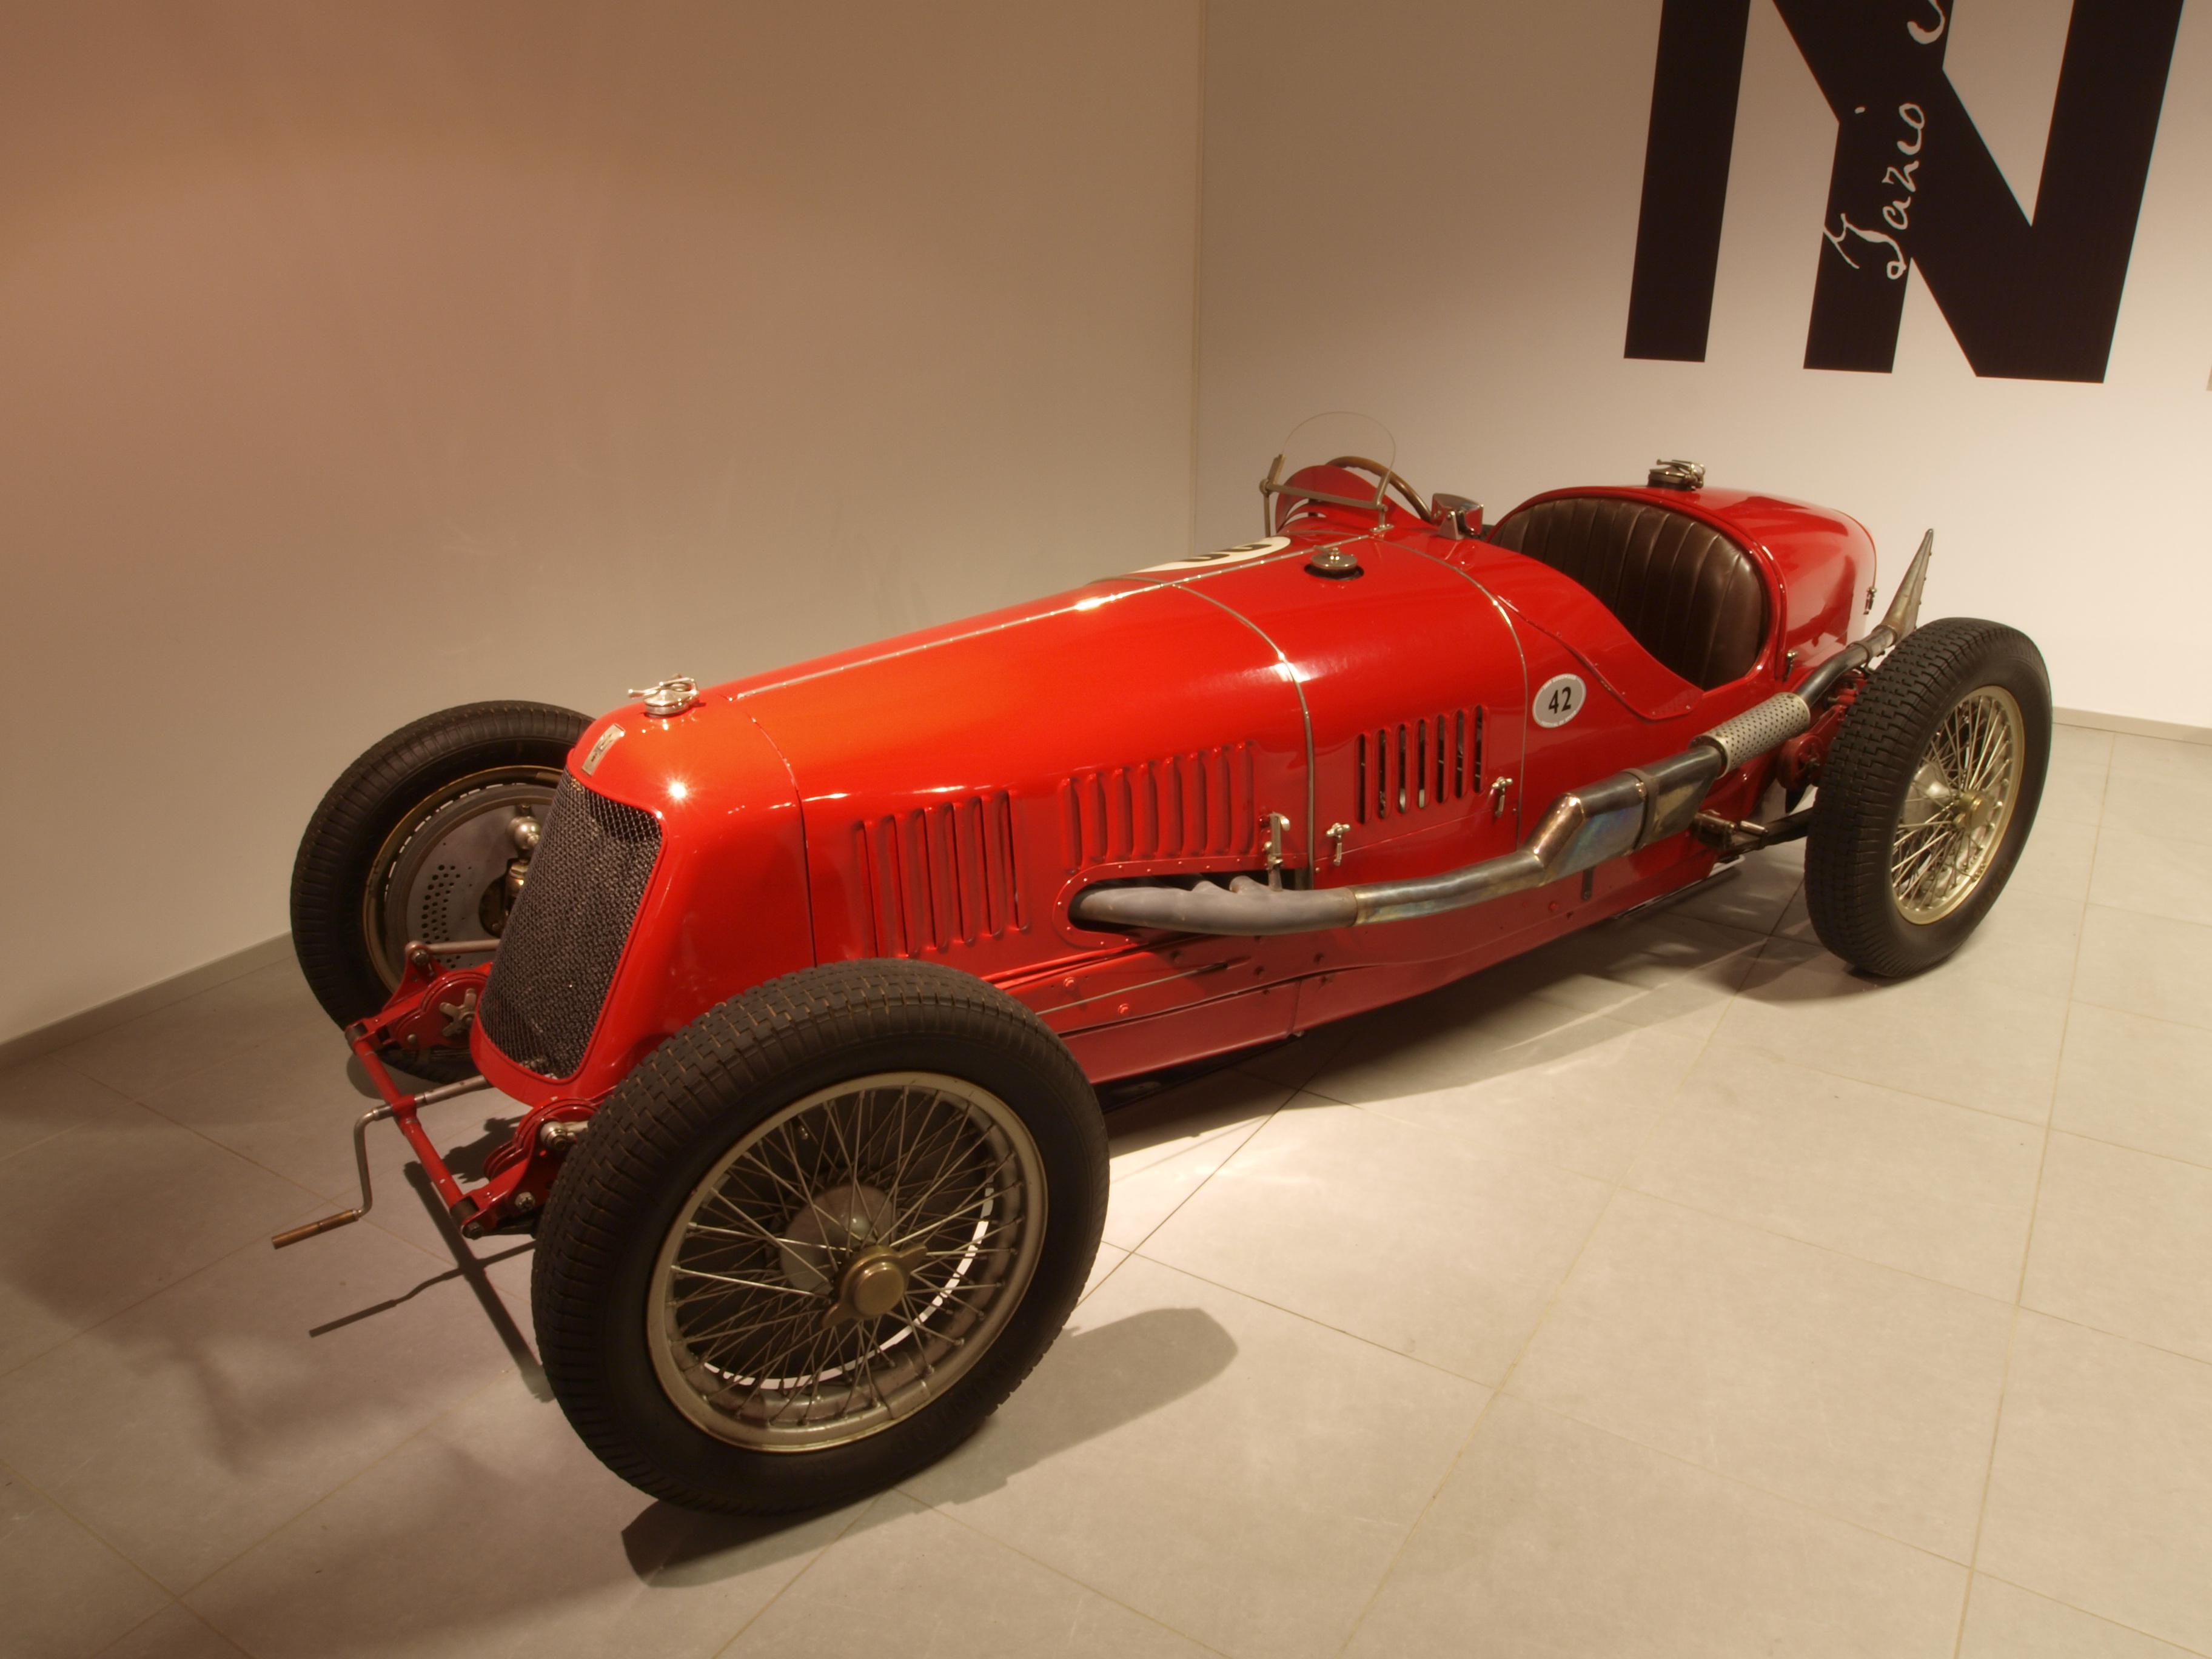 File:1932 Maserati 8C 3000 p2.jpg - Wikimedia Commons